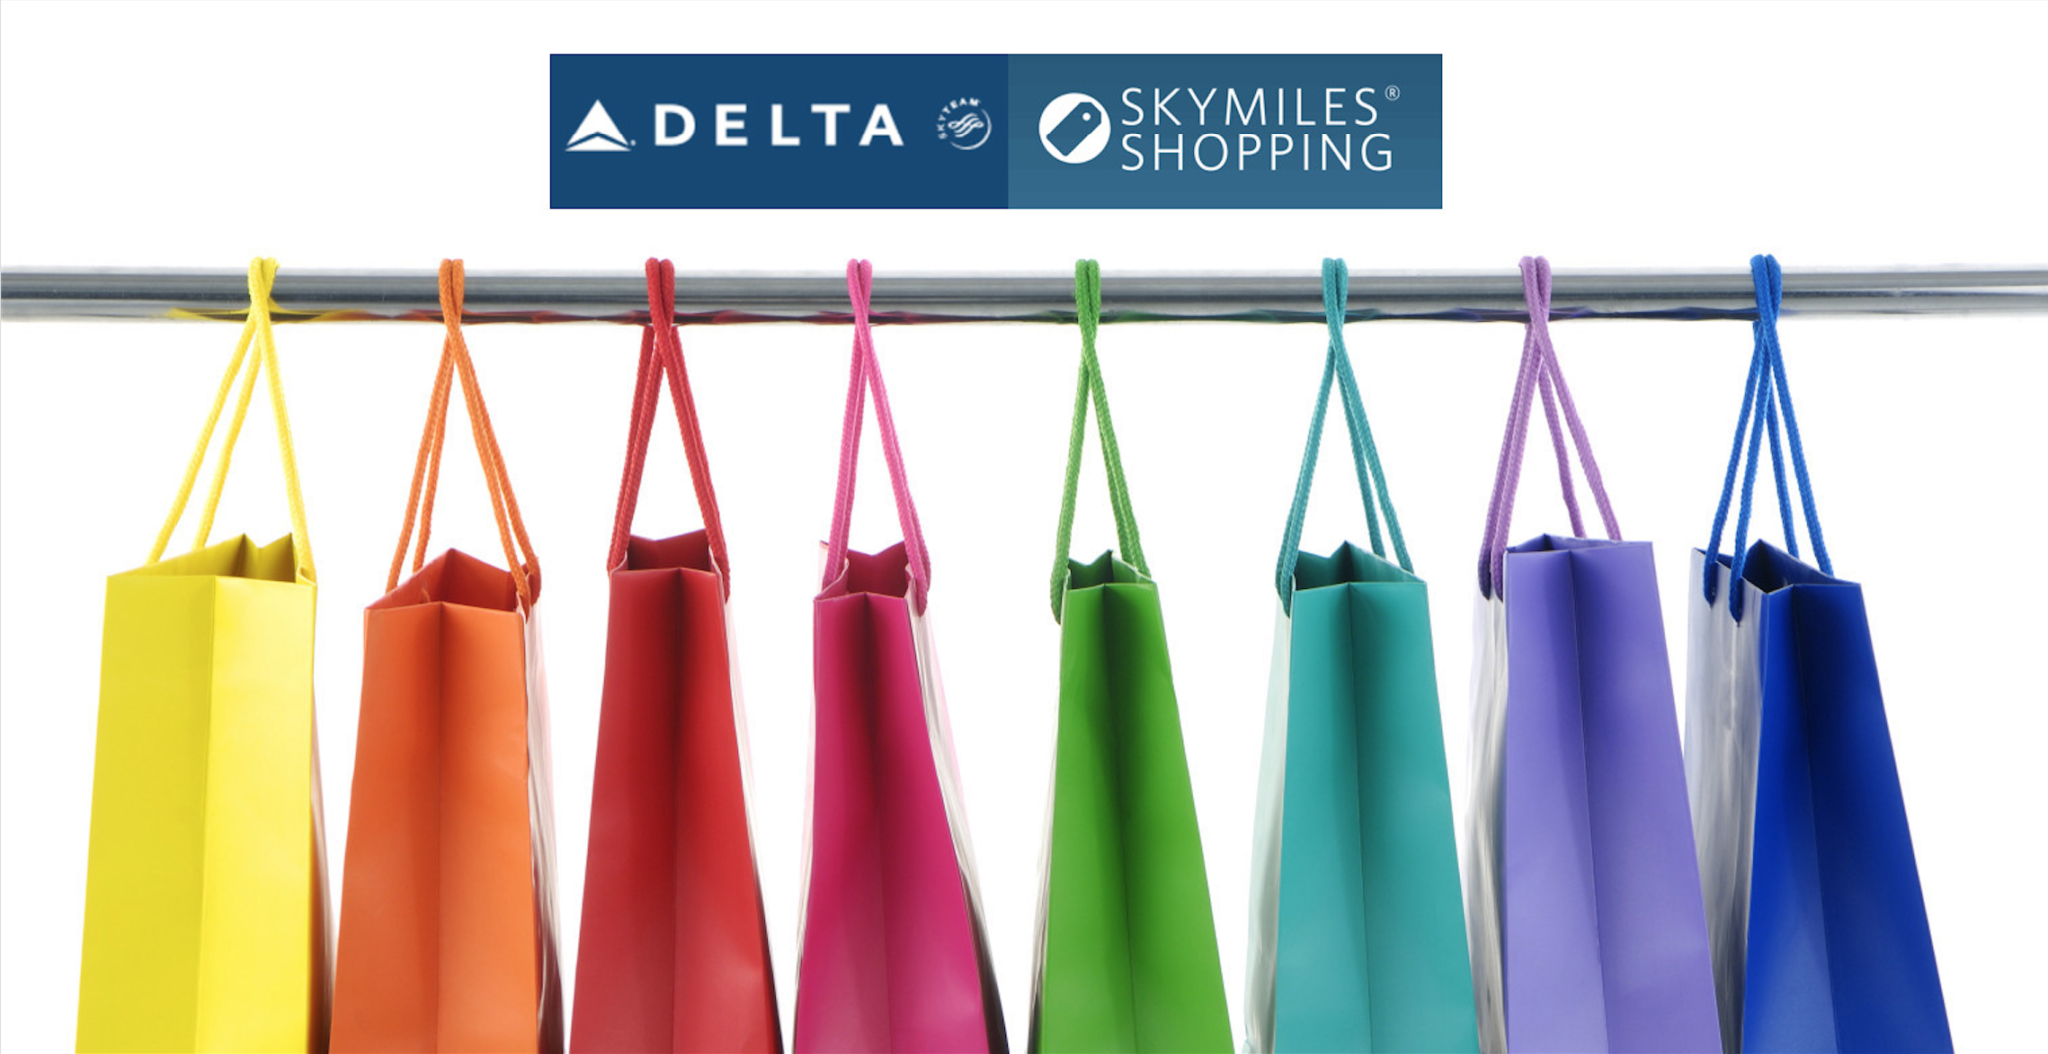 Use the Delta SkyMiles Shopping Portal to Maximize Points [2018]